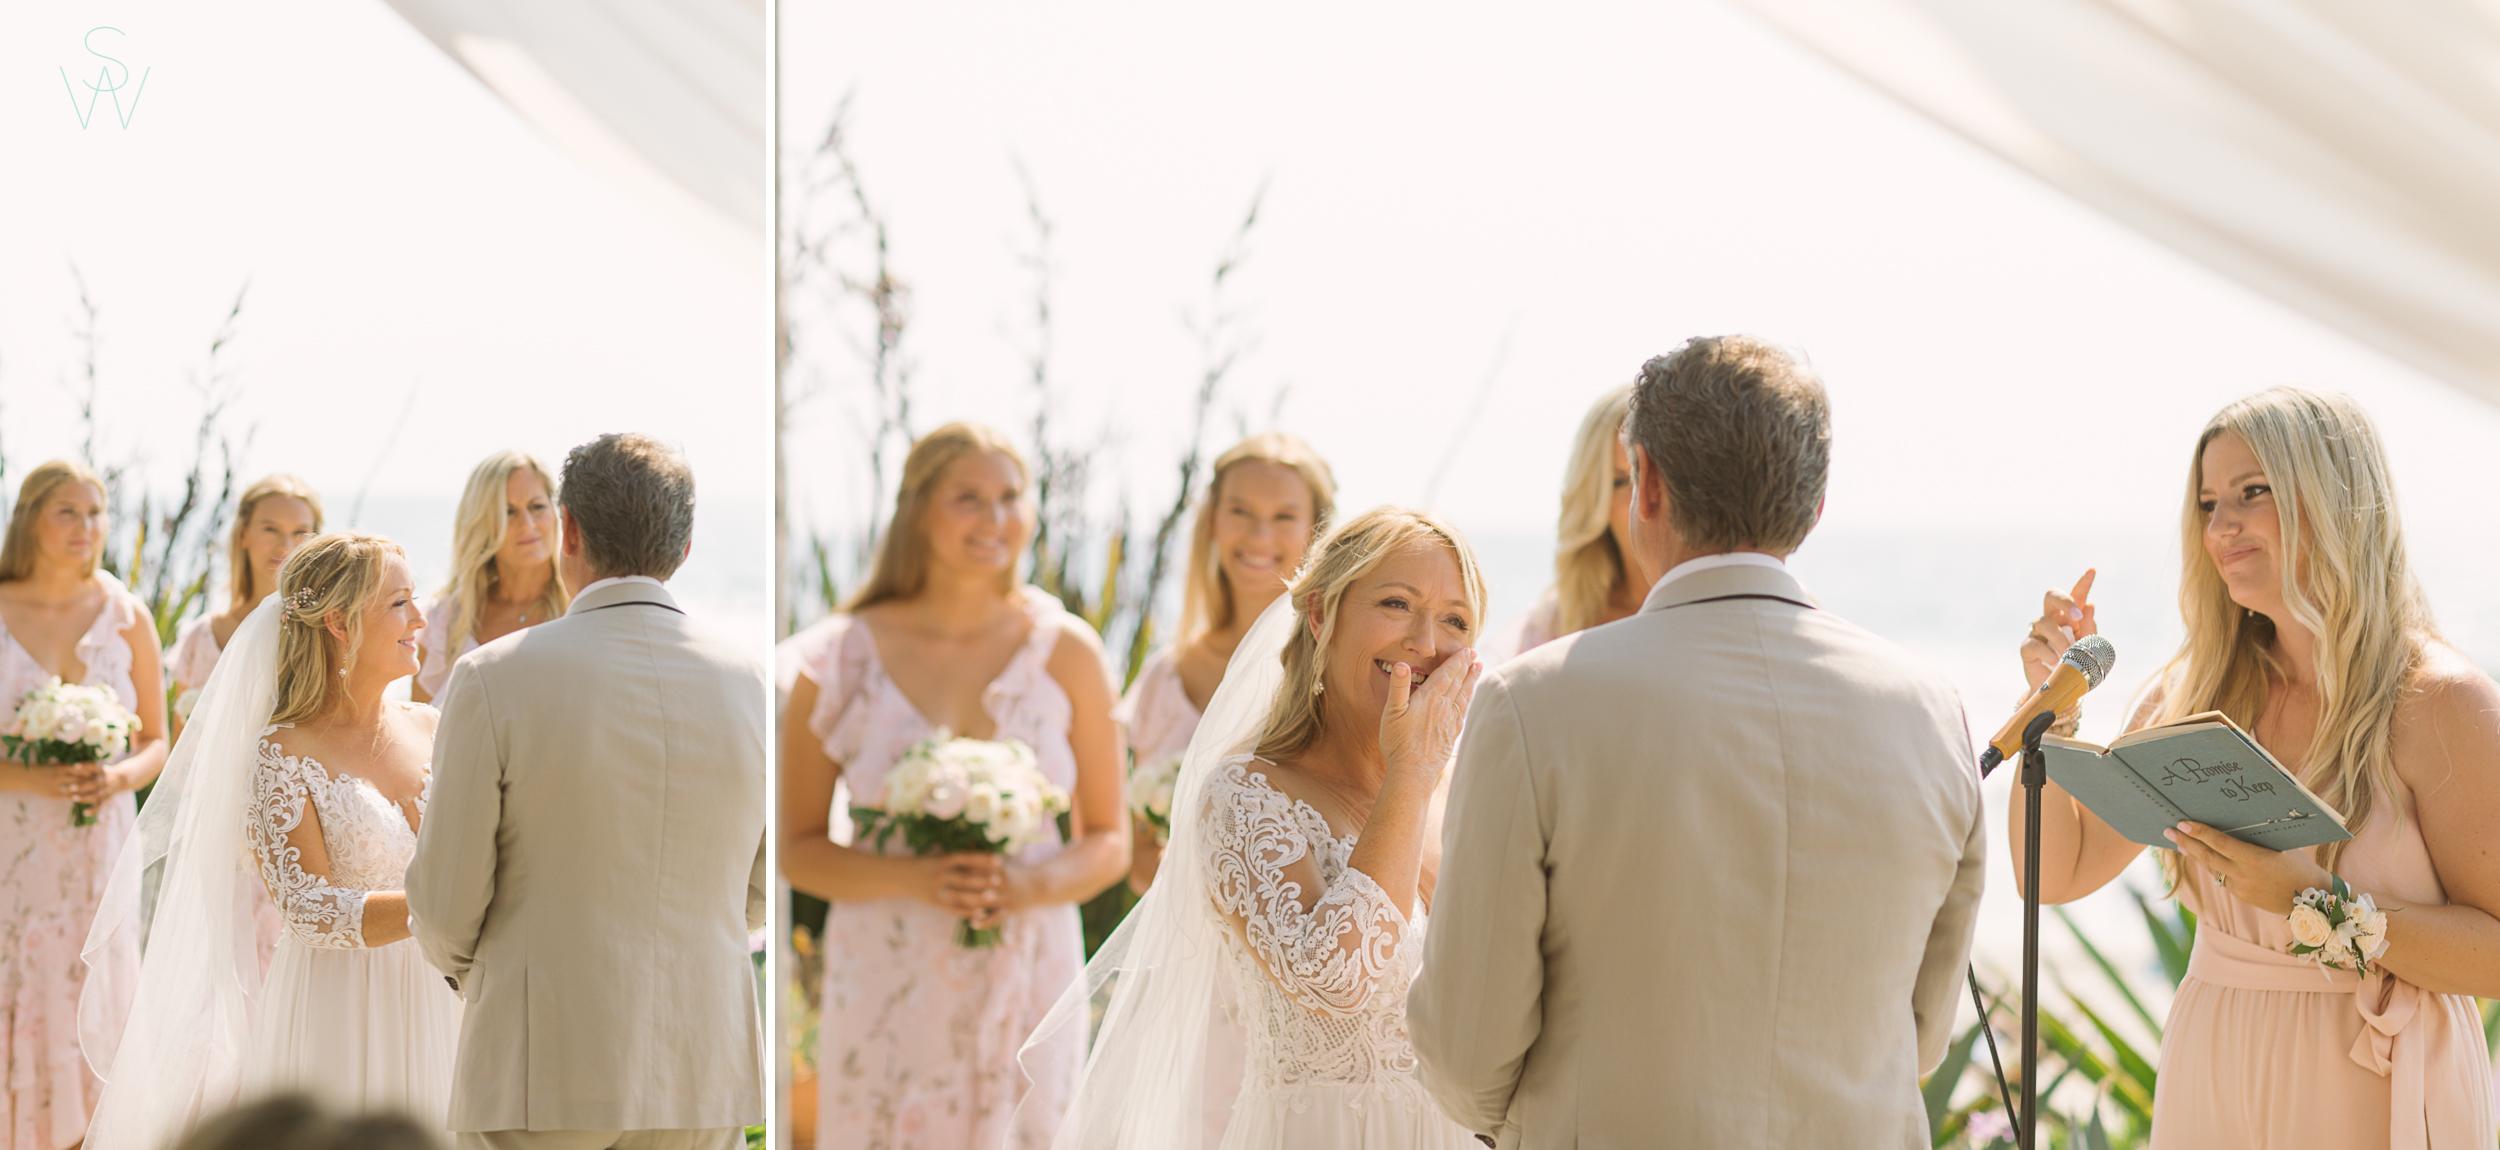 117DEL.MAR.WEDDINGS.photography.shewanders.JPG